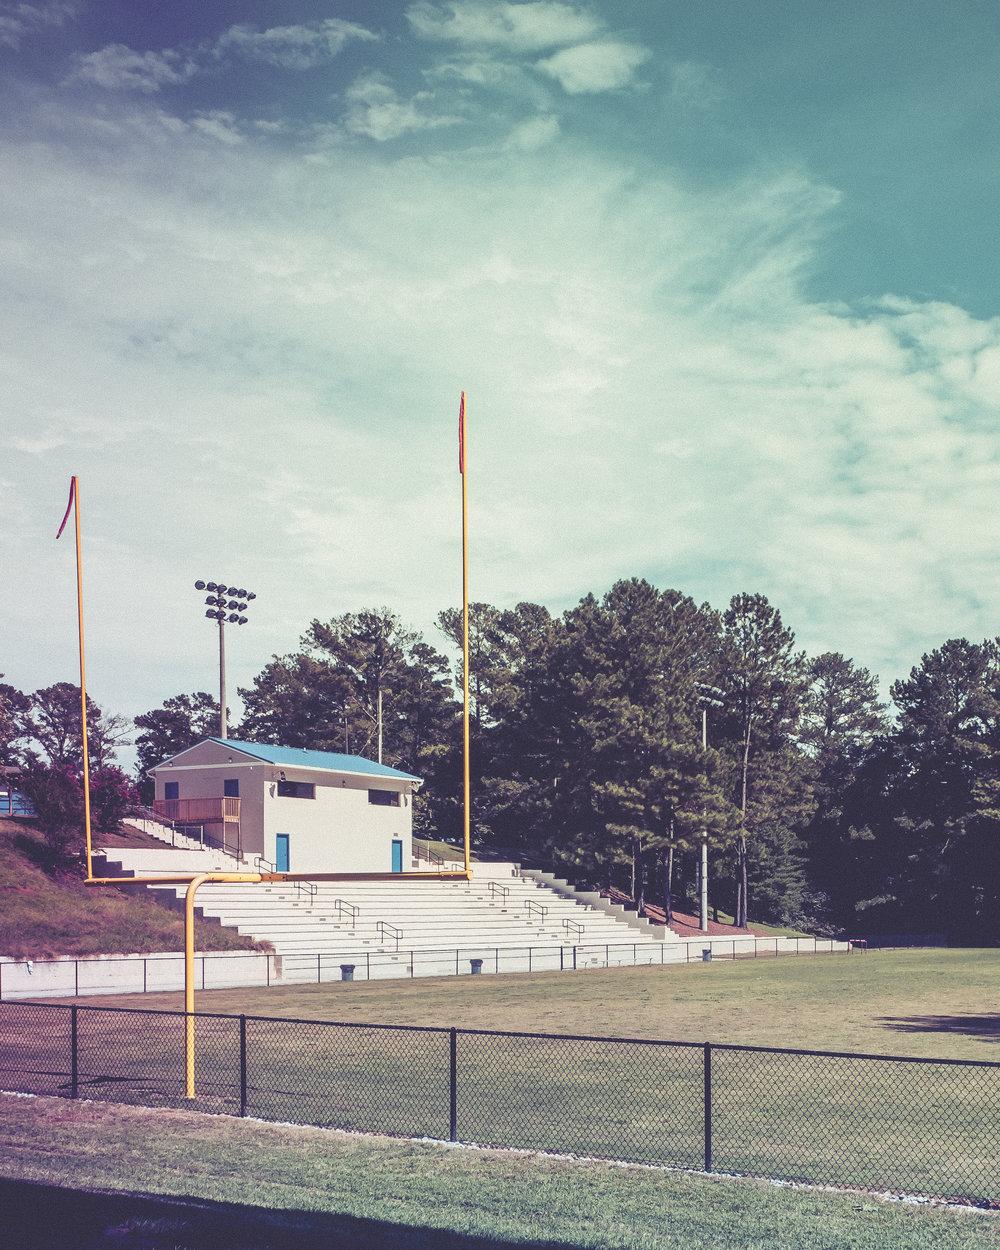 Where it all began, Glenwood Hills Decatur, Georgia